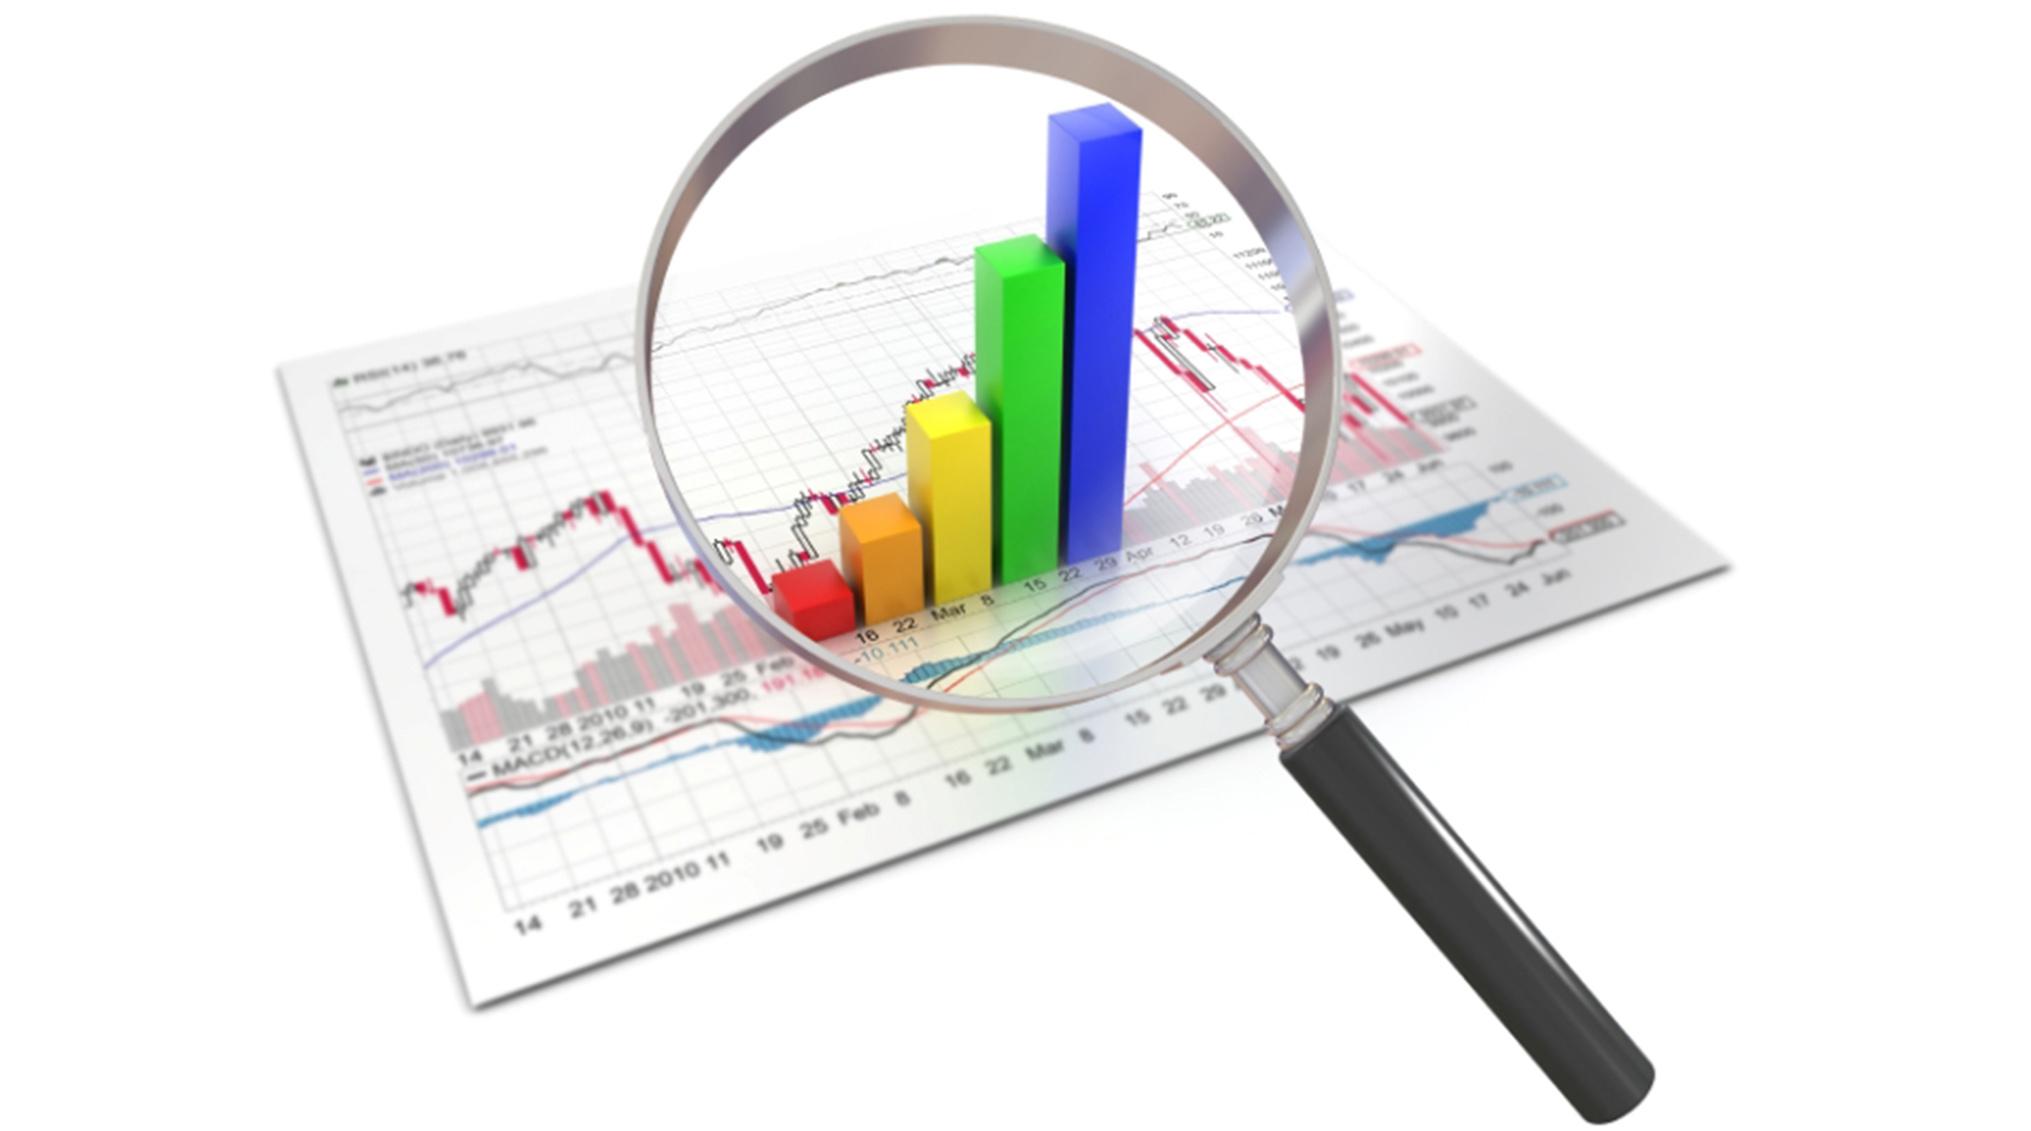 تحلیل وضعیت صنعت کاشی